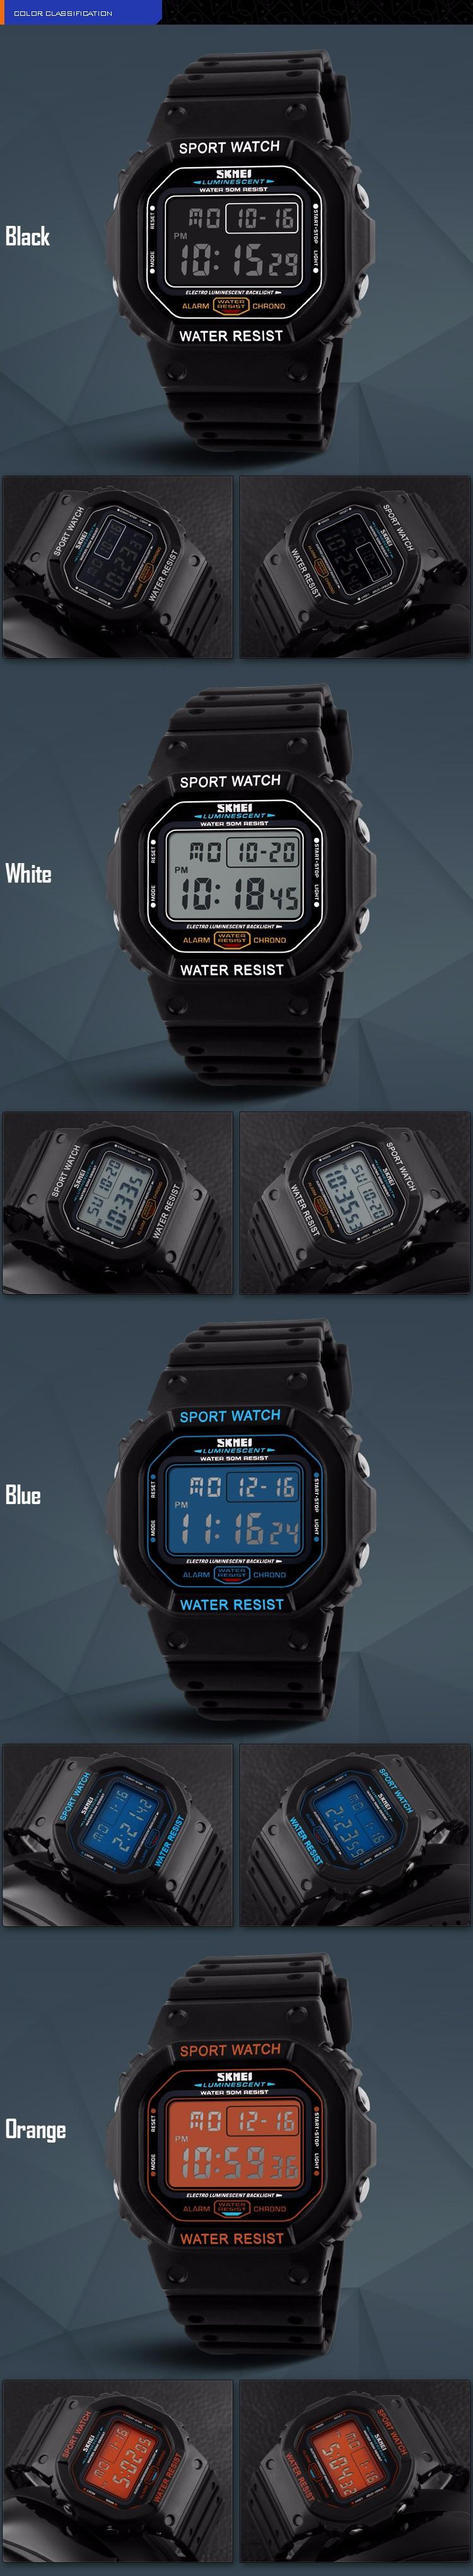 c81108bac Hombre Reloj Skmei Preguntas Sobre Digital Para Comentarios Detalle yvbf7gY6